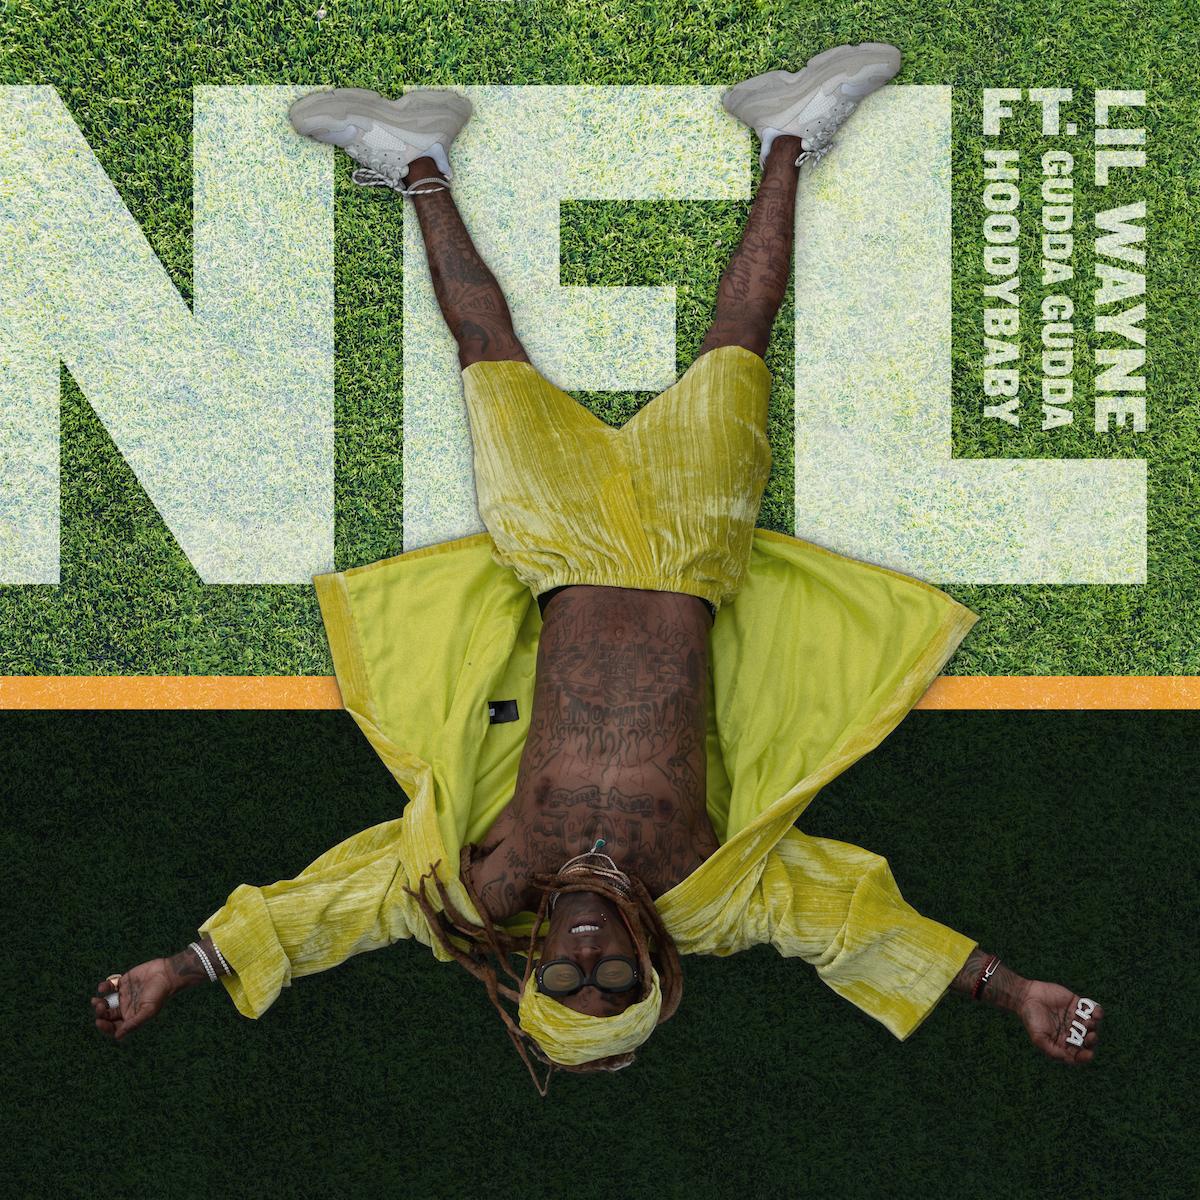 lil wayne nfl song artwork Lil Wayne Reveals New Single NFL Featuring Gudda Gudda and HoodyBaby: Stream